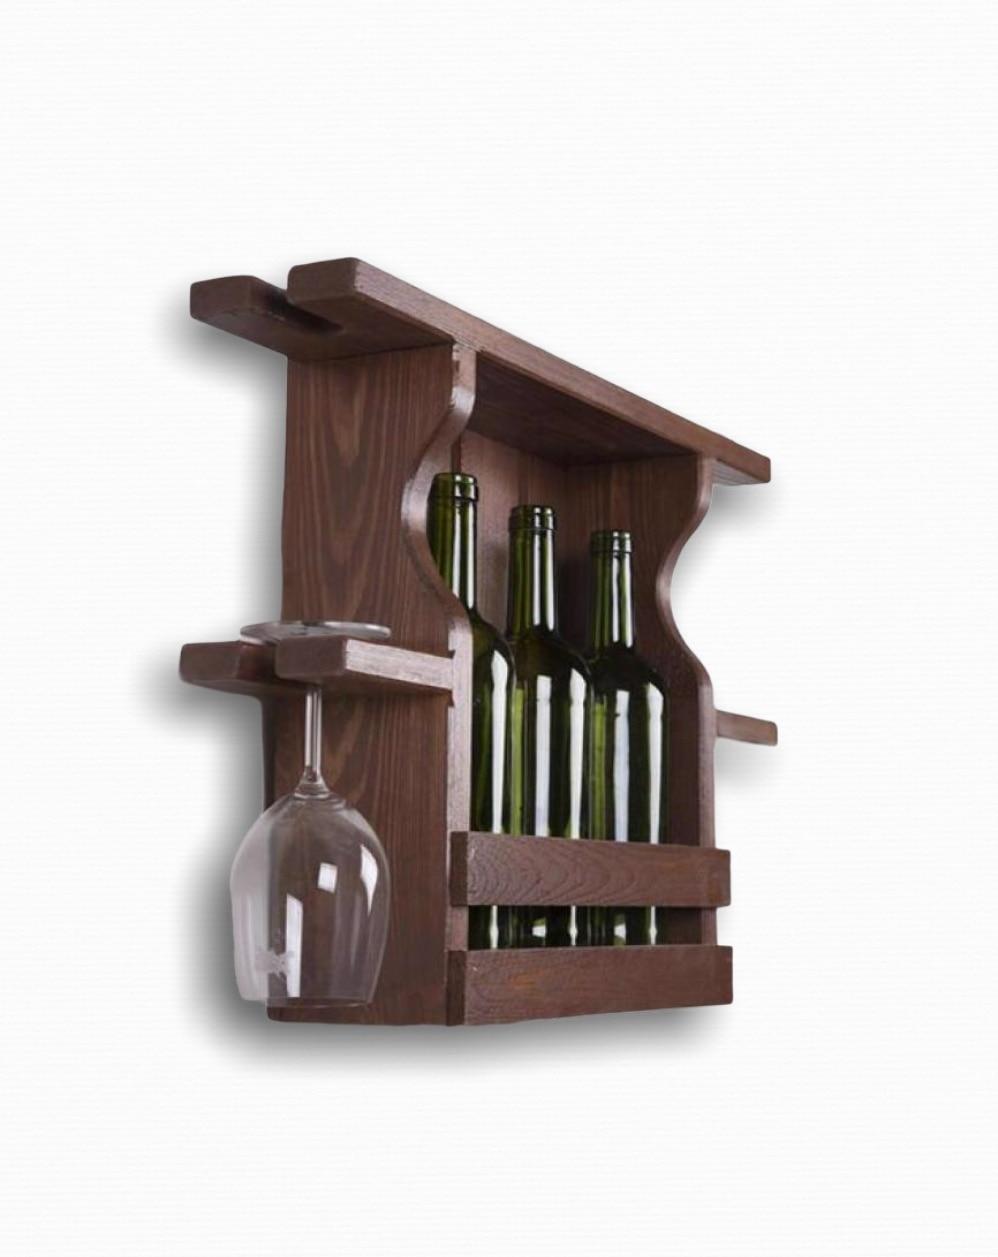 Natural Massive Wood Wine Stand Rack Bottle Cabinet Creative Holders Decorative Wooden Goblet Hanger Interior Decoration недорого